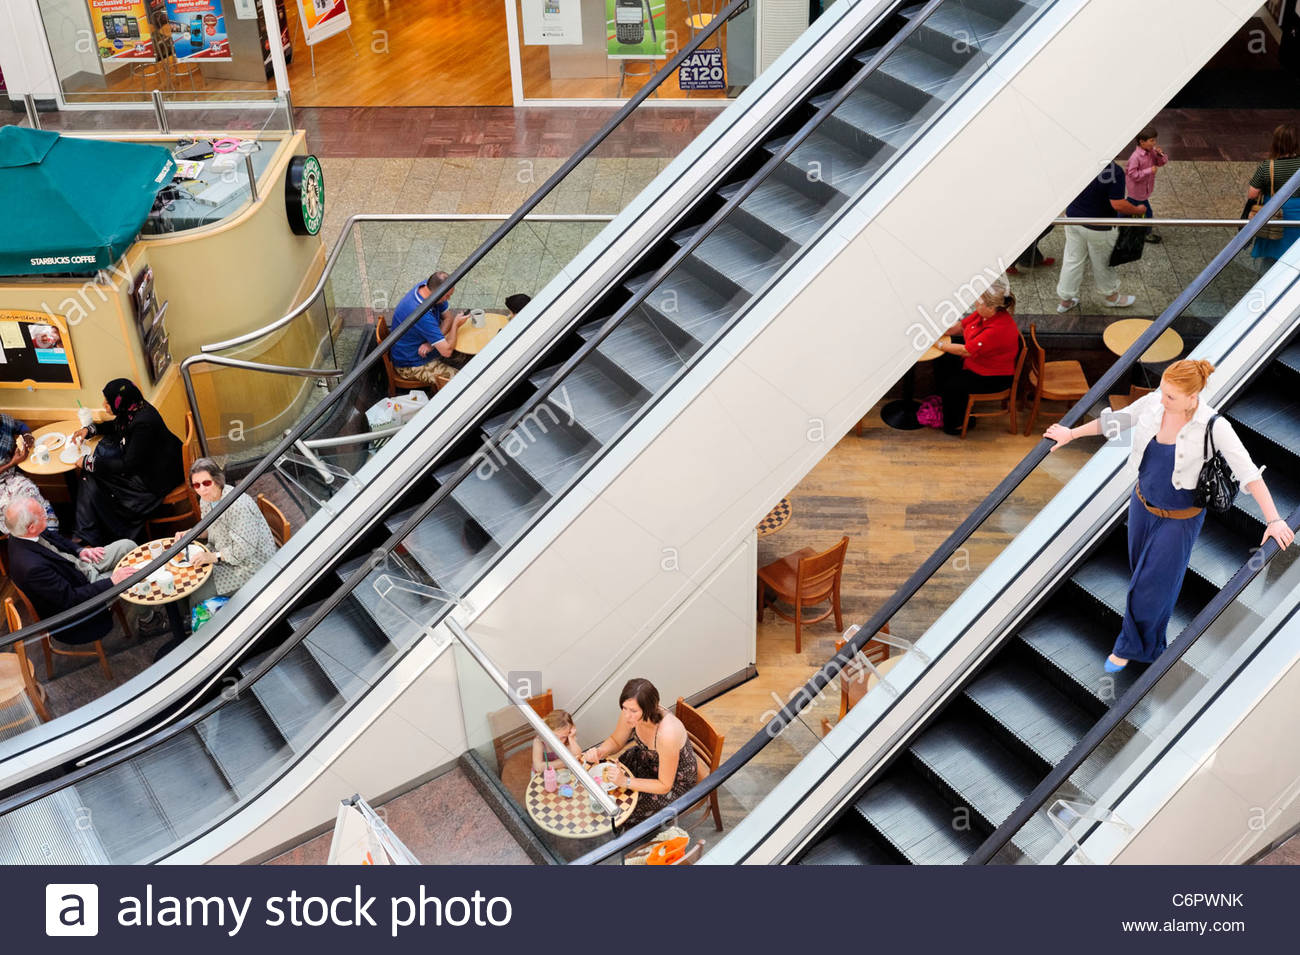 Escalators at Cribbs Causeway shopping mall, Bristol, England, UK. - Stock Image